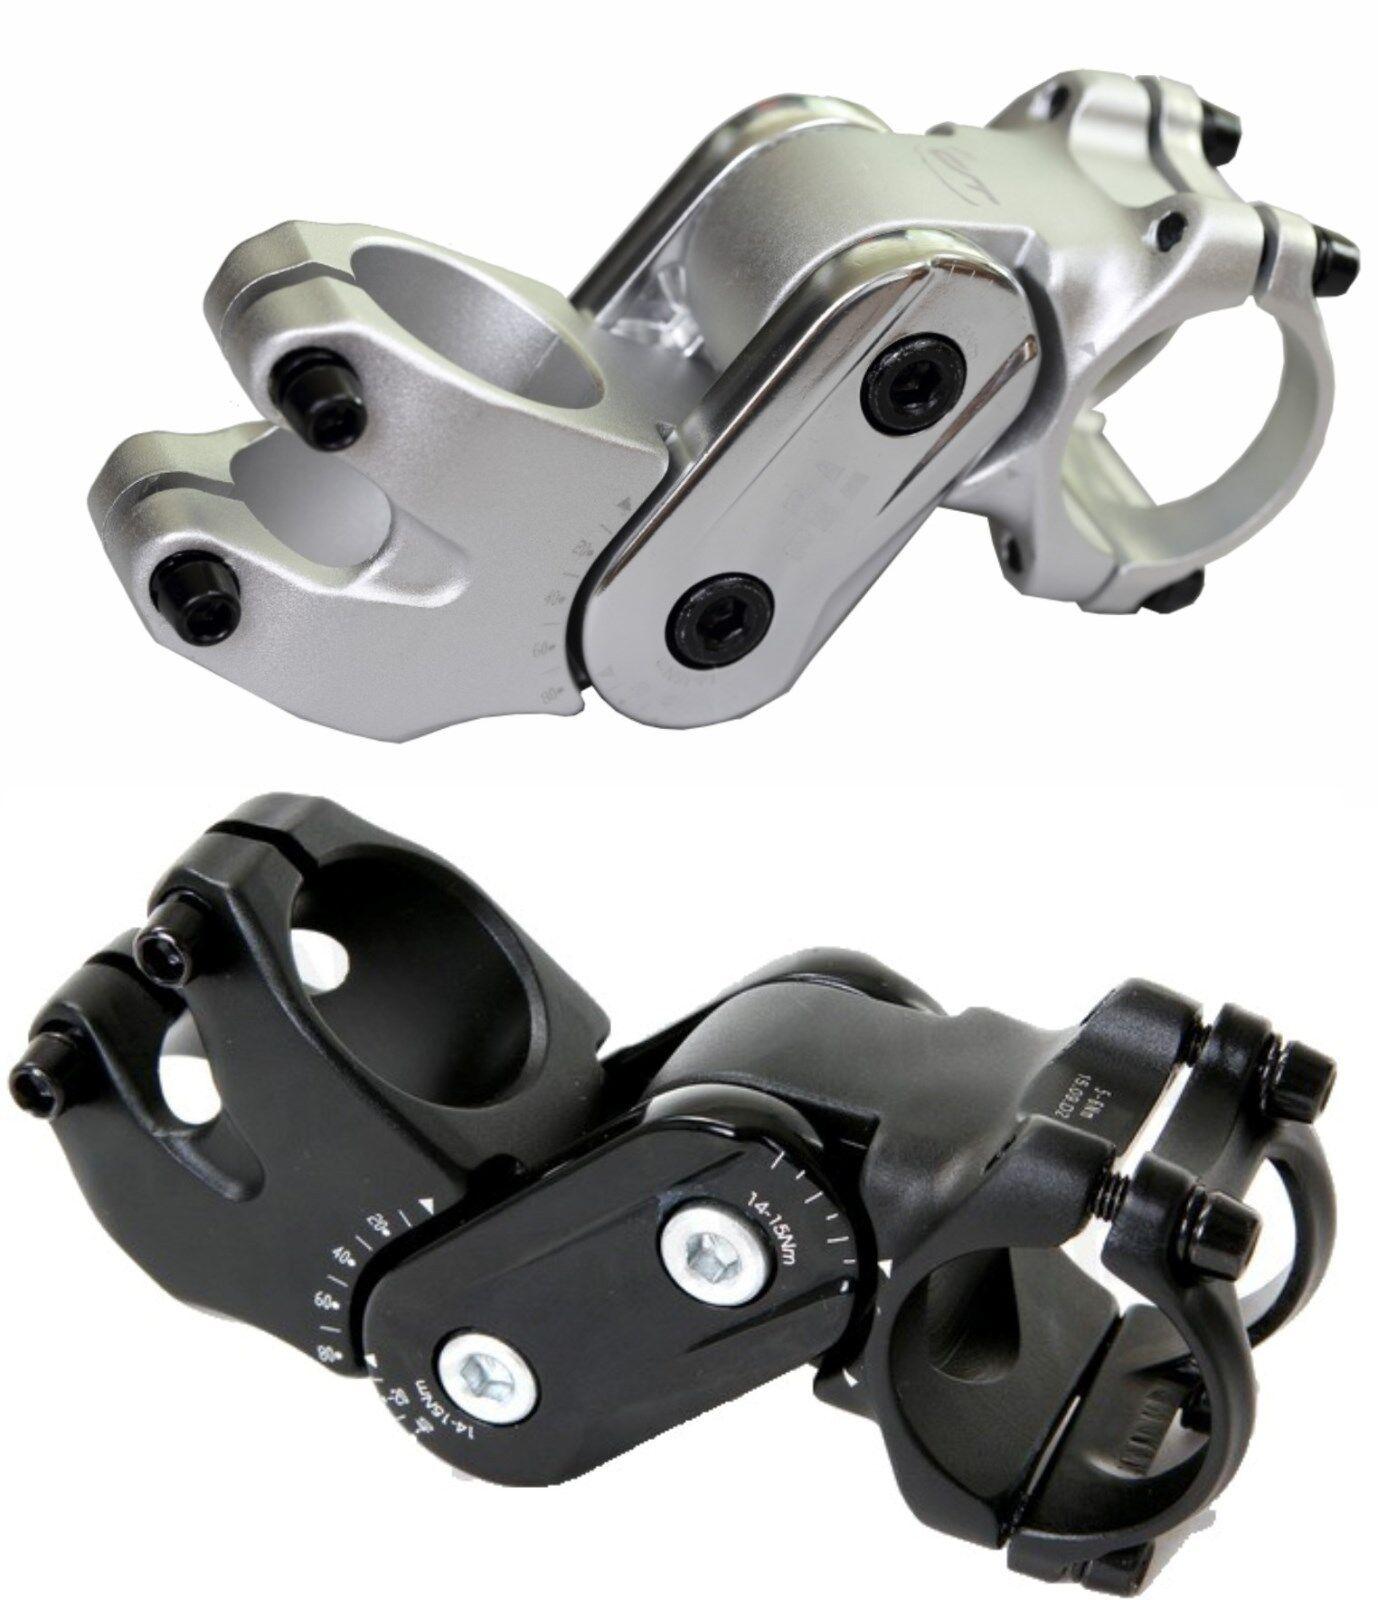 Gallows contec cobra  2-piece adjustable 25 4 31 8mm handlebars 1 1 8  100 mm  online at best price